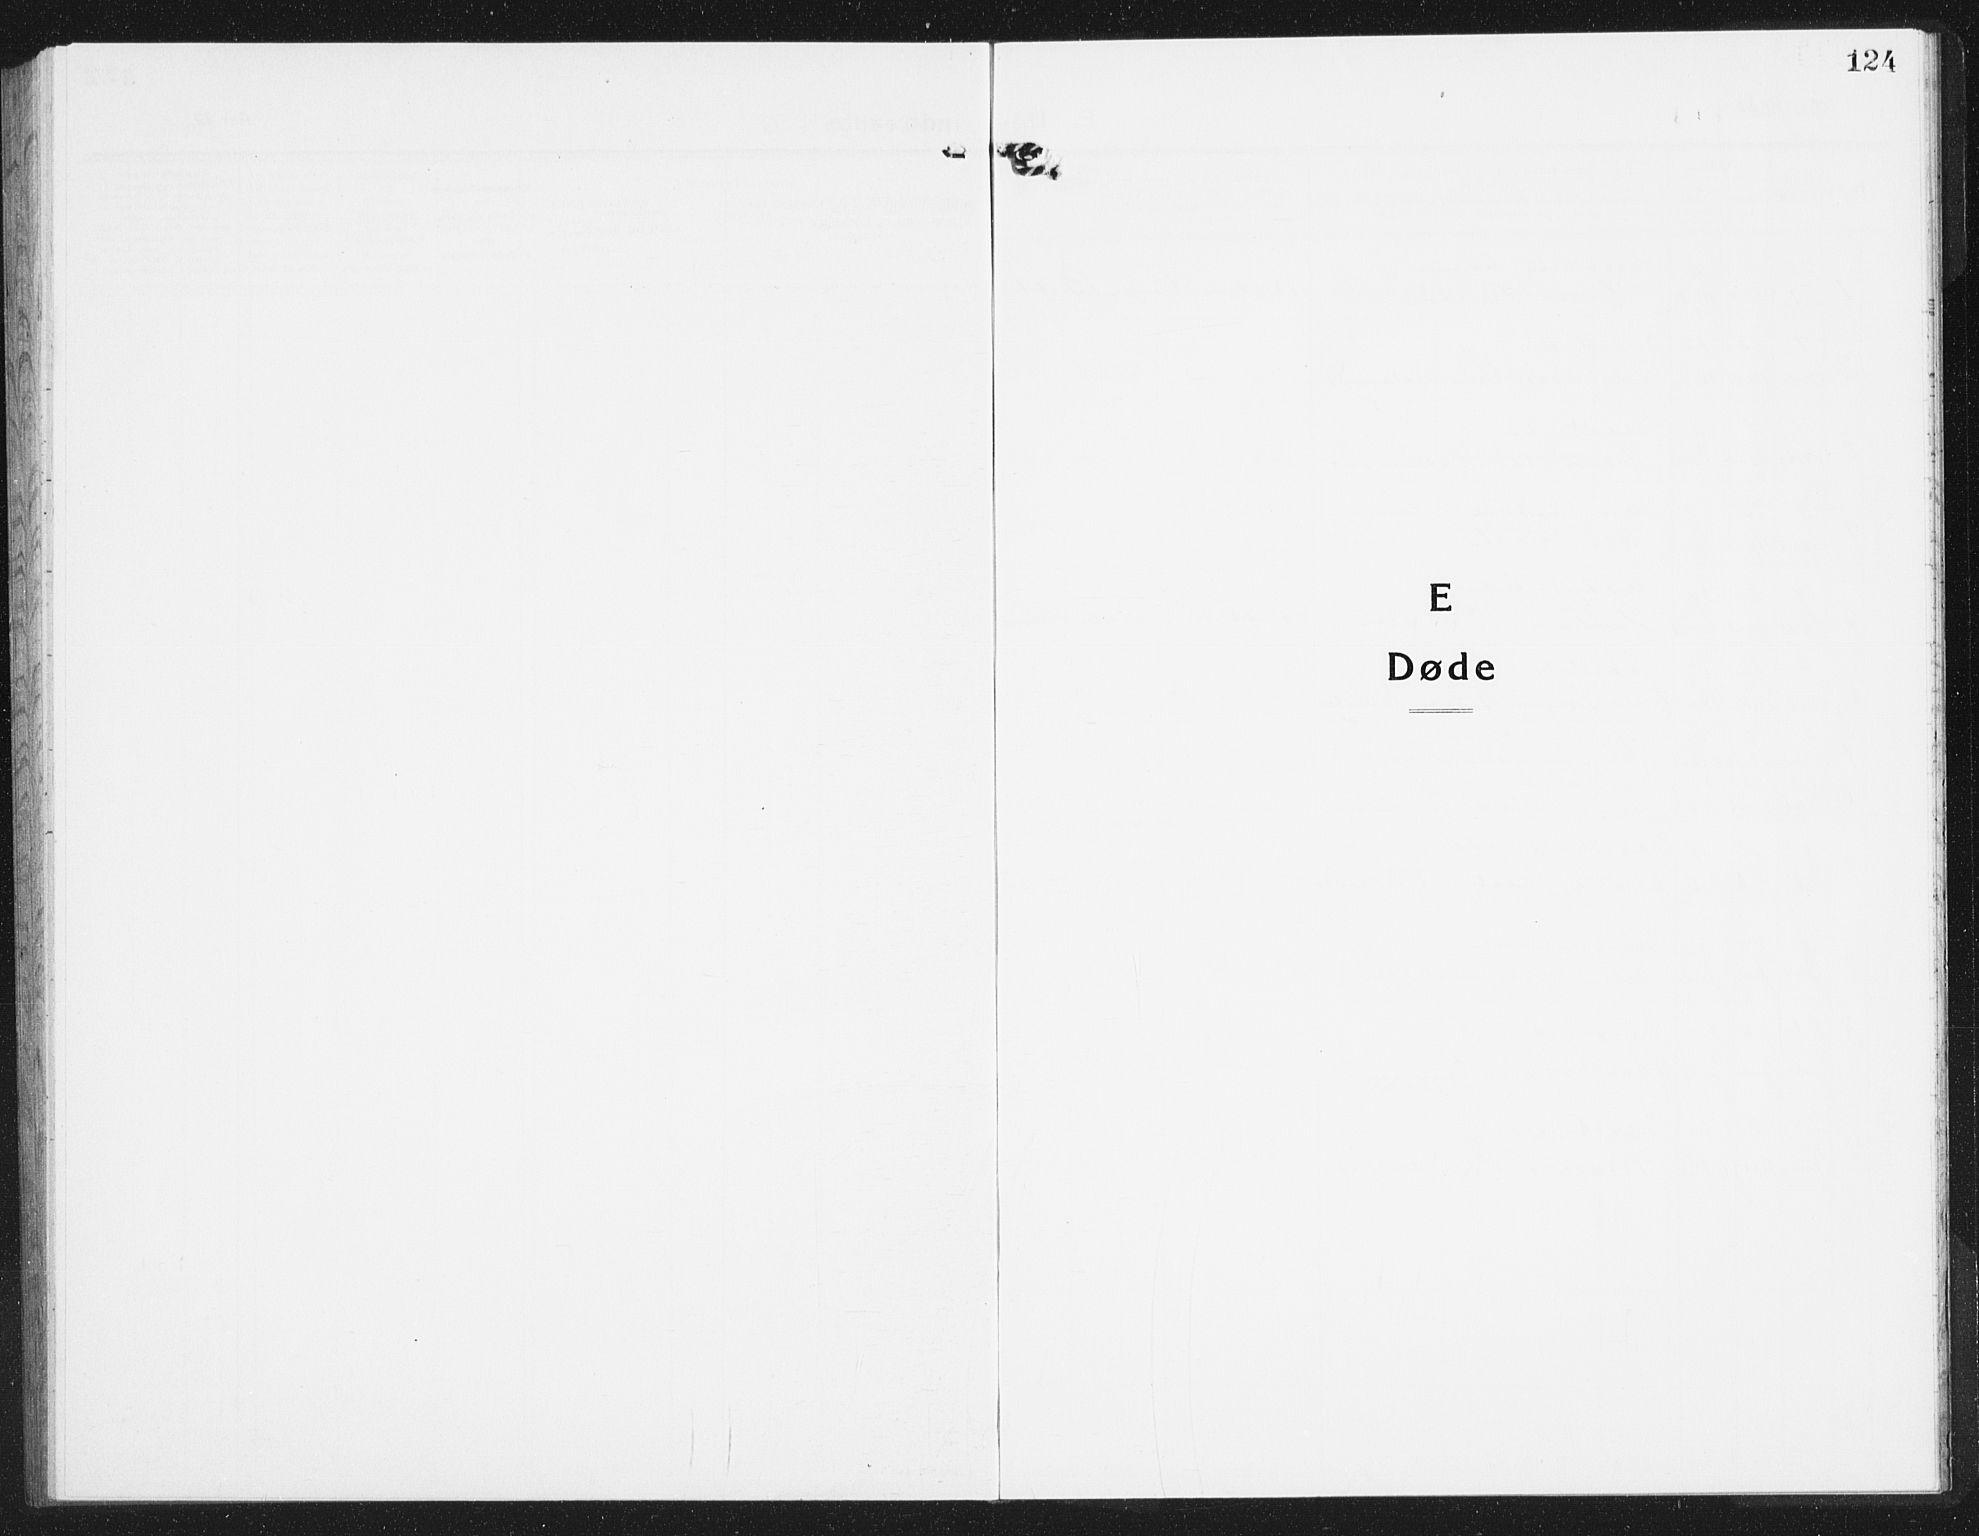 SAST, Kopervik sokneprestkontor, H/Ha/Hab/L0007: Klokkerbok nr. B 7, 1918-1942, s. 124